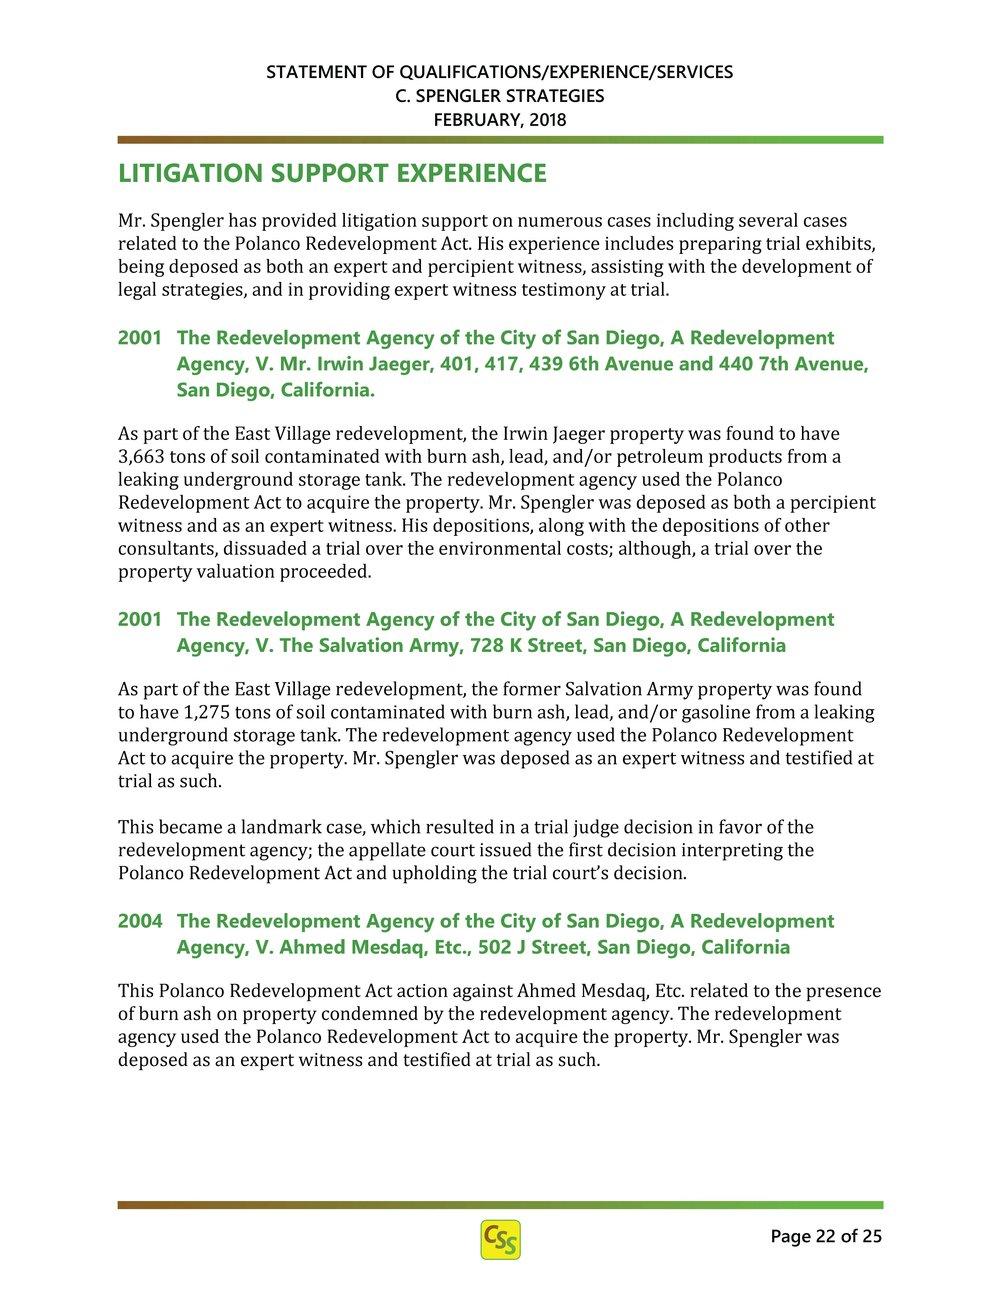 C.Spengler Strategies SOQ.2.13.18_Page_23.jpg